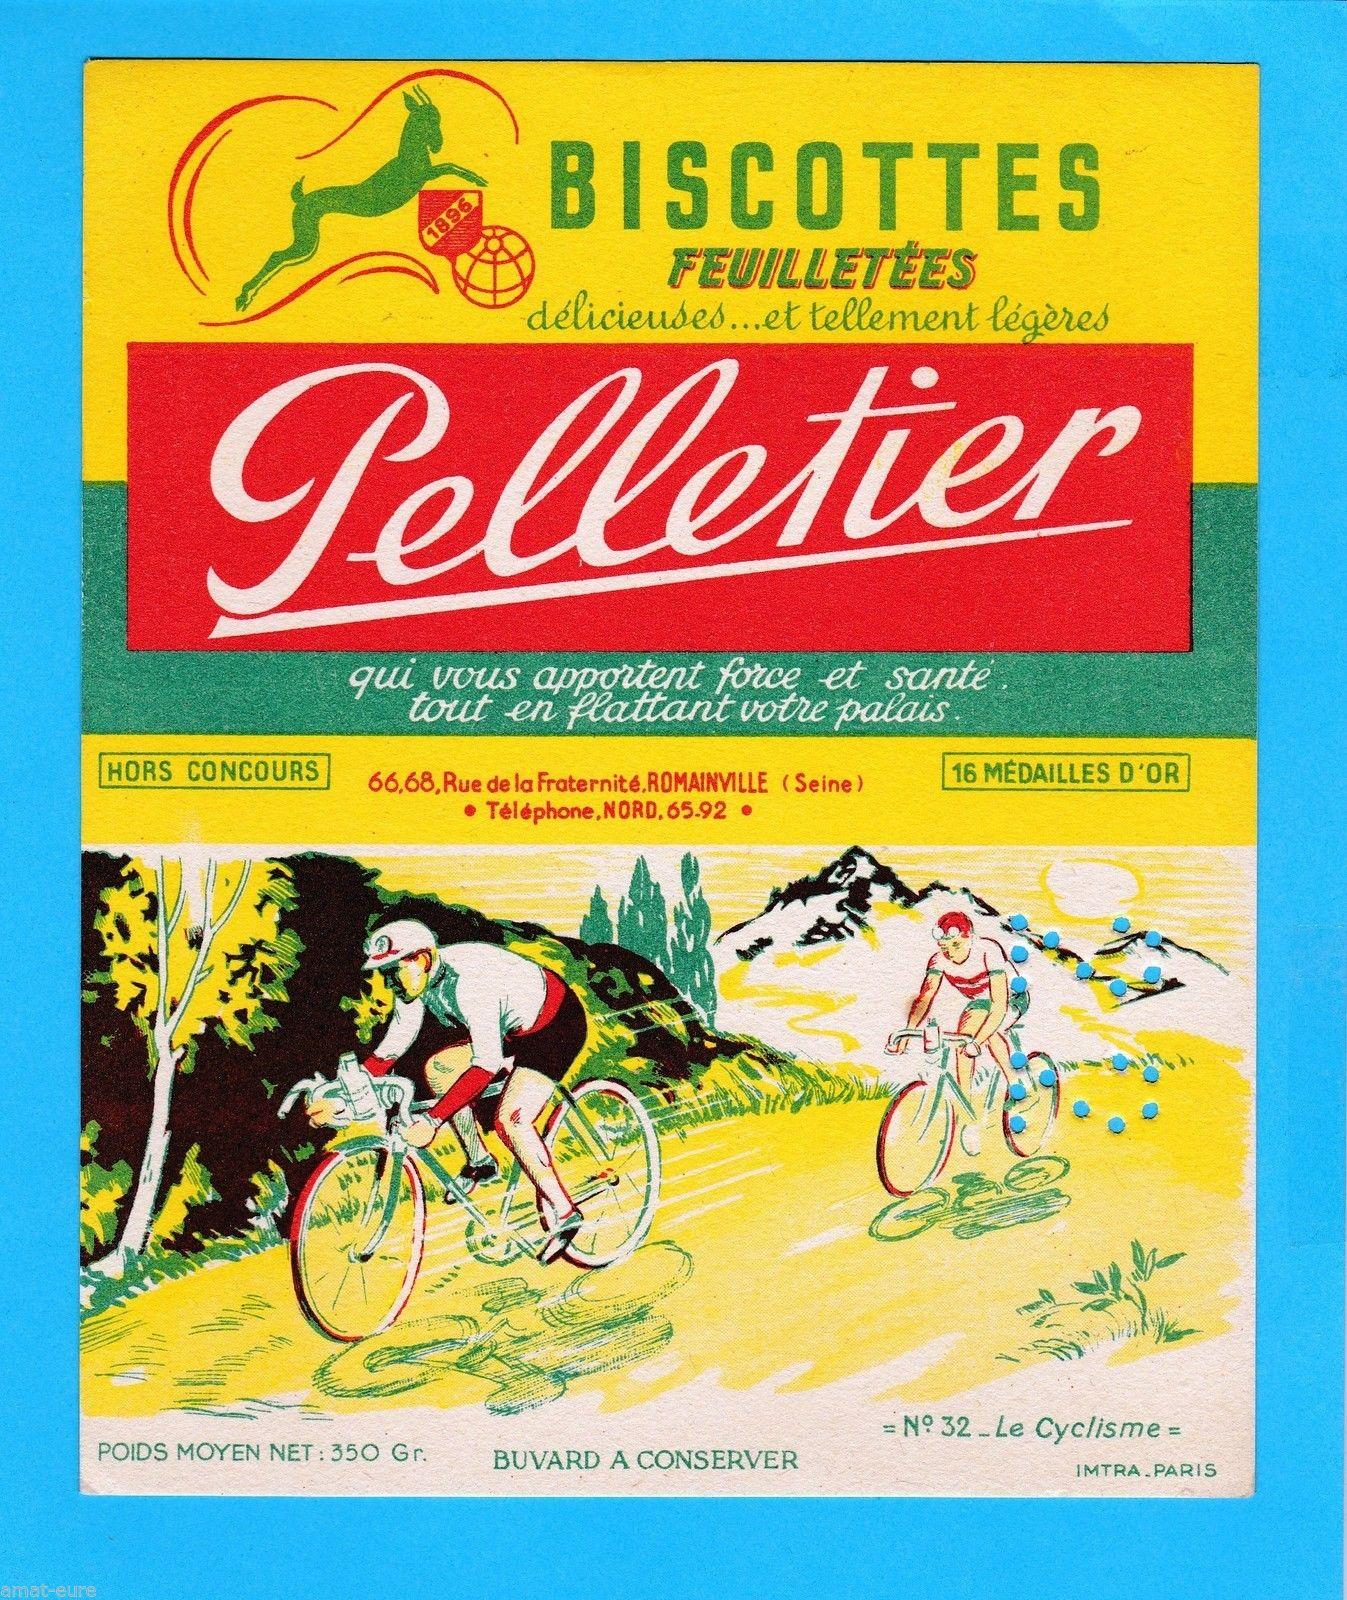 pelletier.jpg